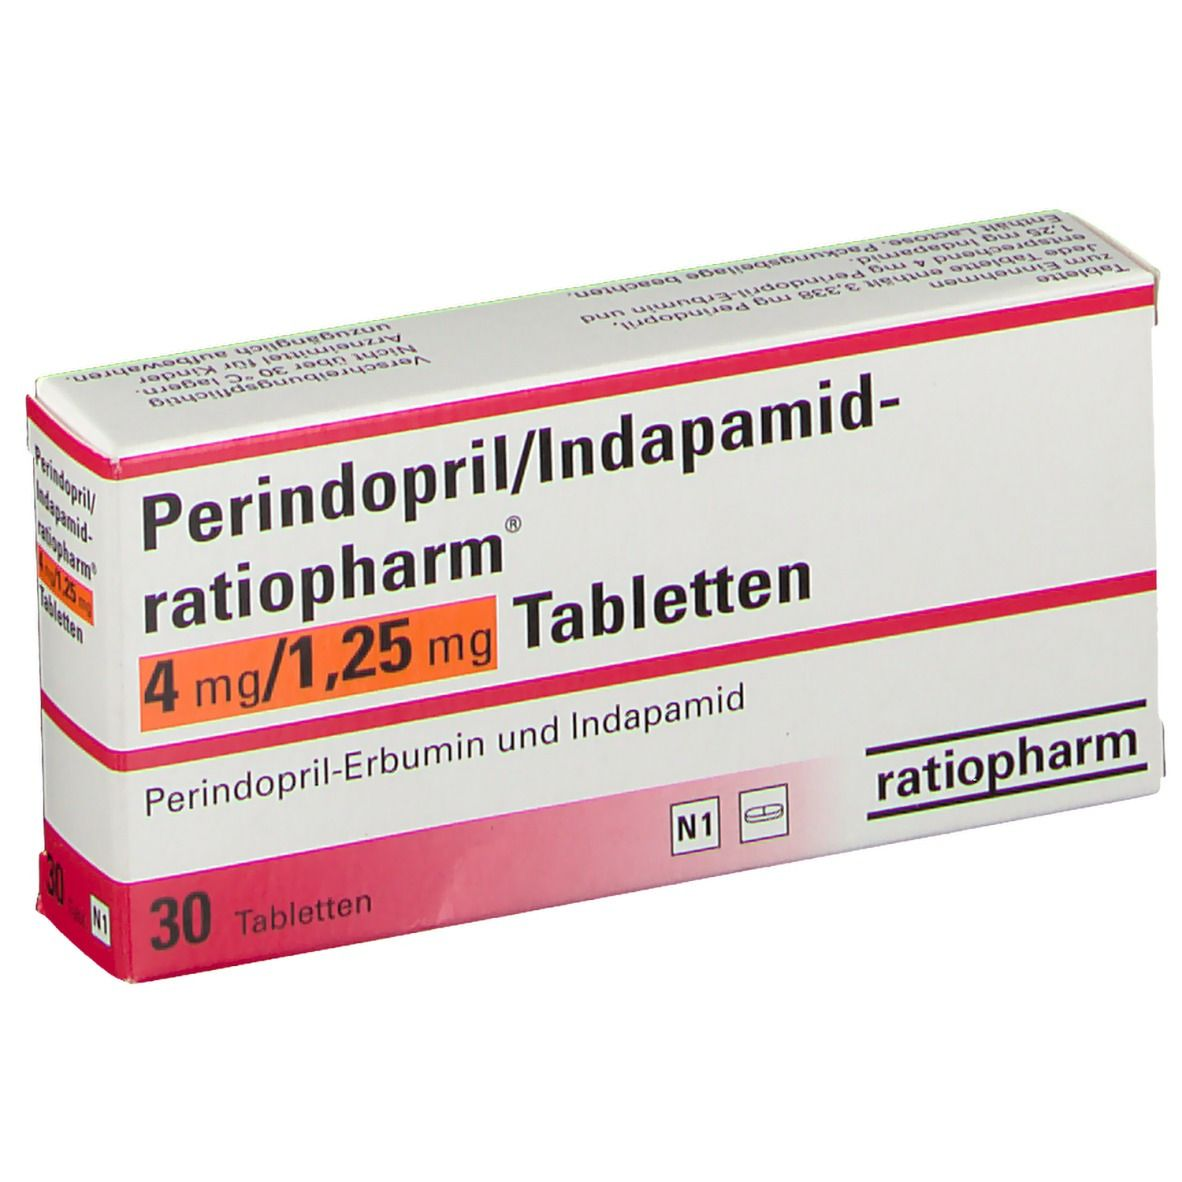 Perindopril/Indapamid ratiopharm® 20 mg/20,20 mg 20 St   shop ...